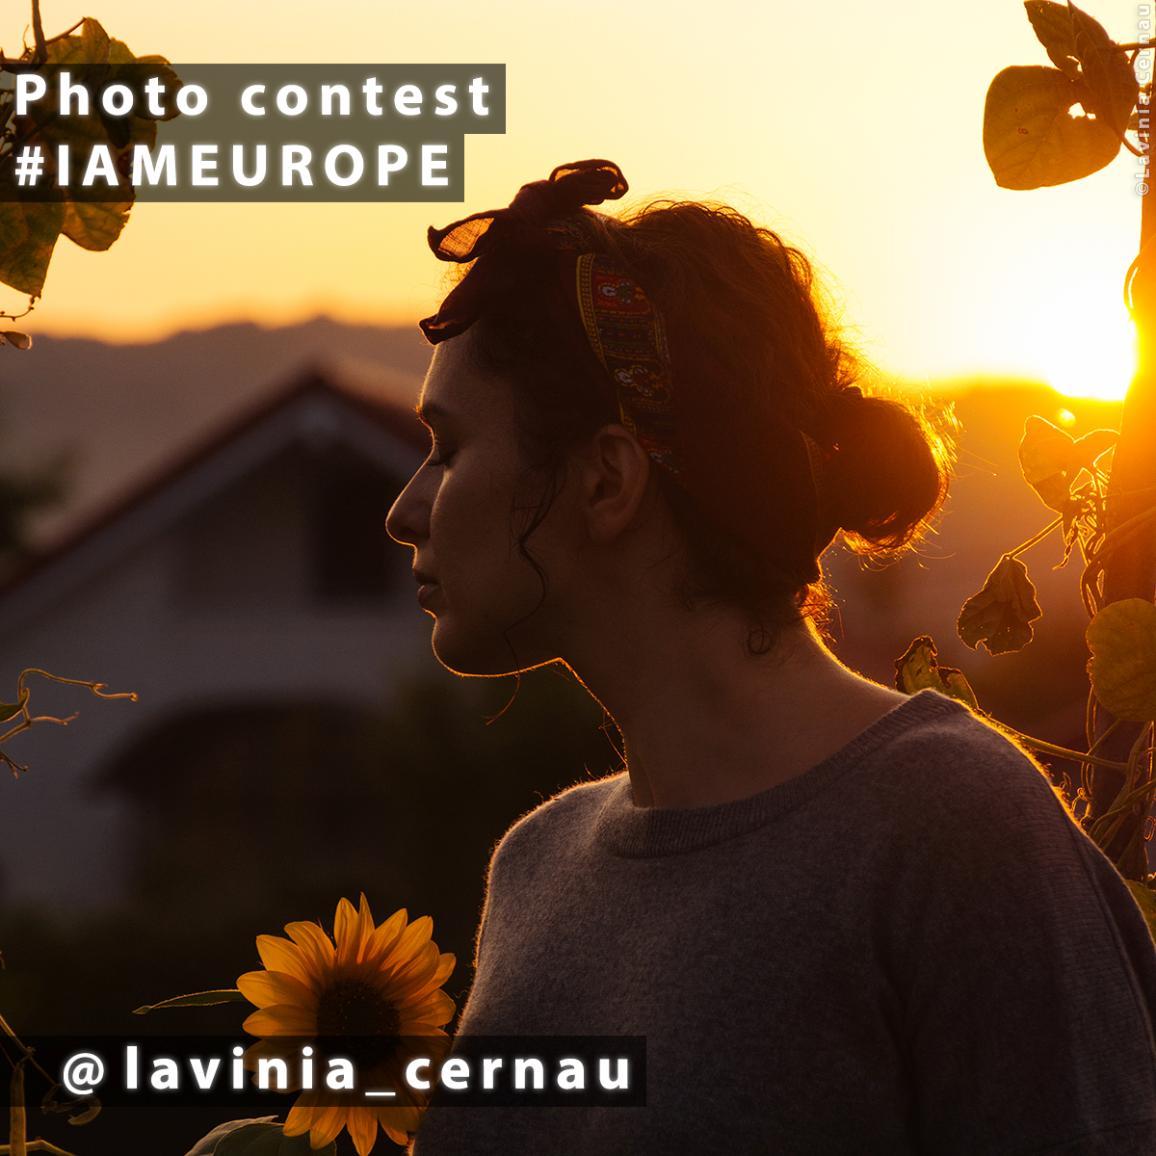 Foto: Muchas gracias al fotógrafo rumano, Lavinia Cernau (instagram @lavinia_cernau) por dar su testimonio en el concurso.